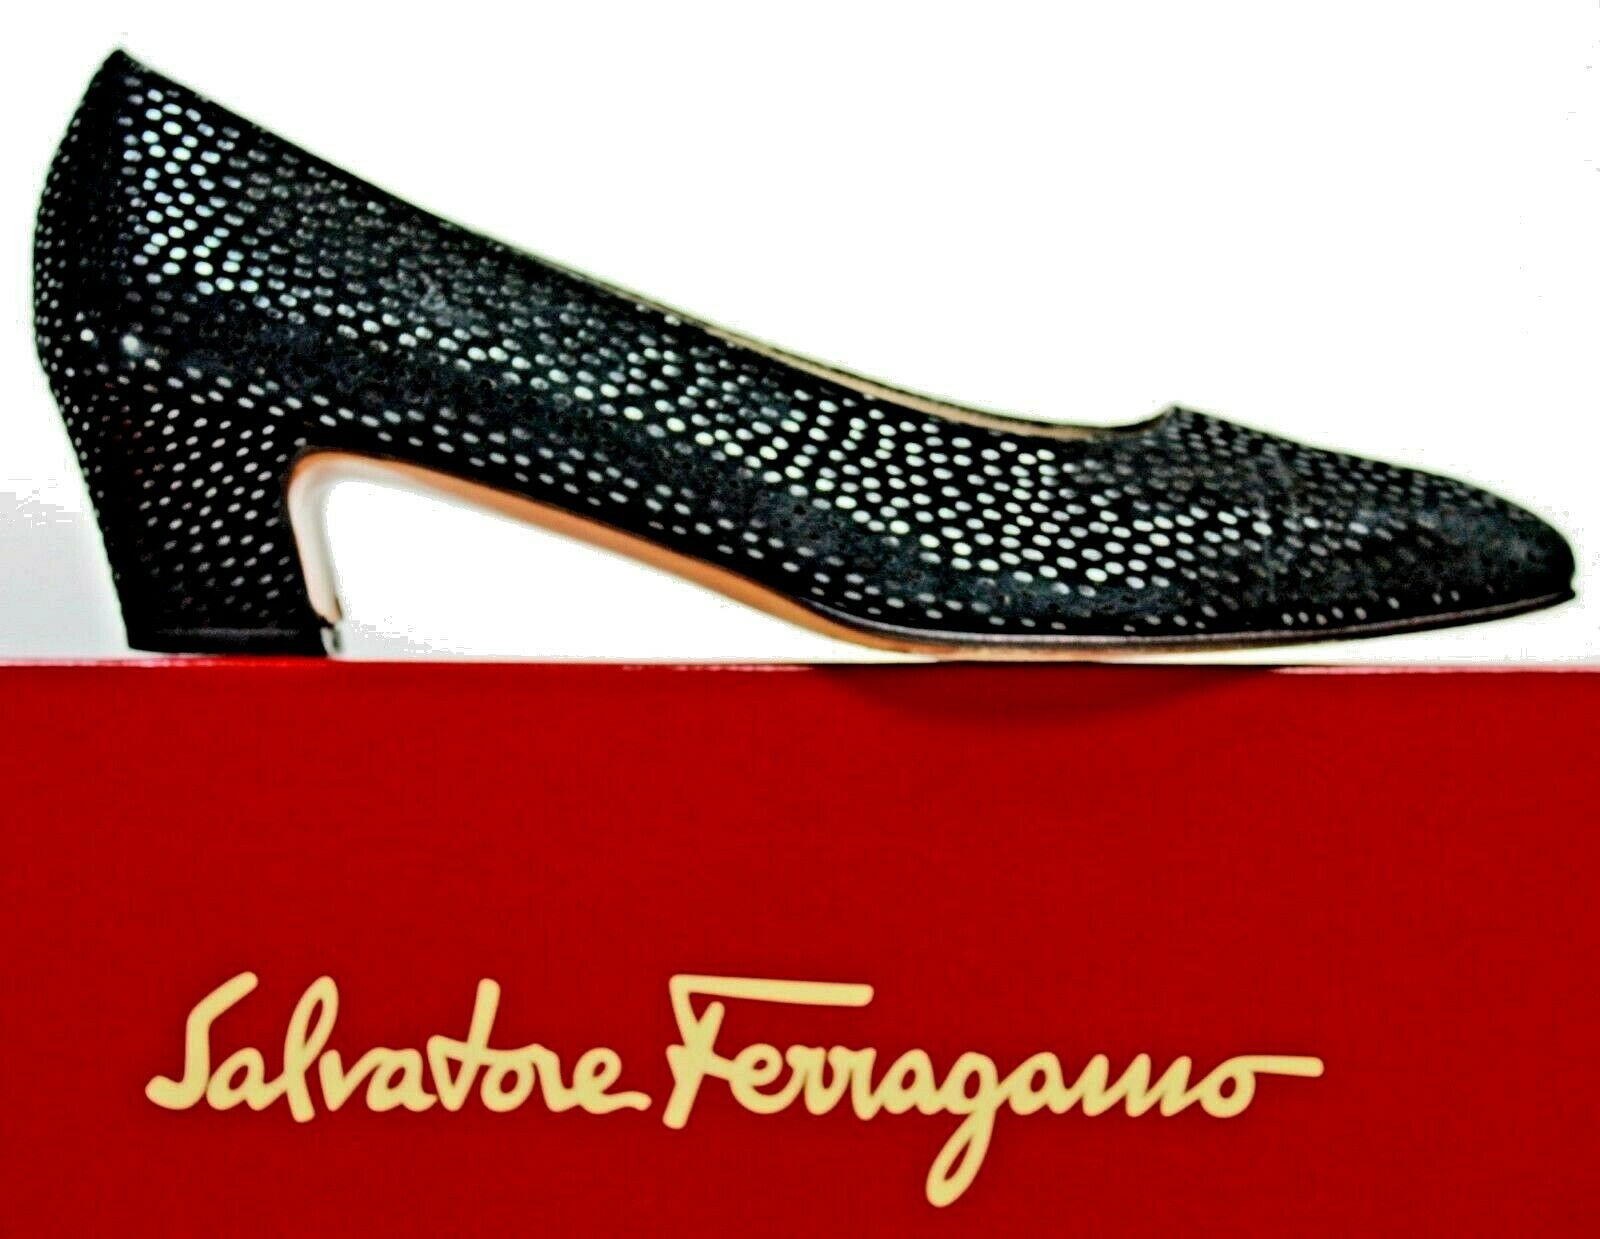 Salvatore Ferragamo Womens Pump sz 9.5 9.5 9.5 3A Black Textured Suede Heels shoes WH55 d7bcf6